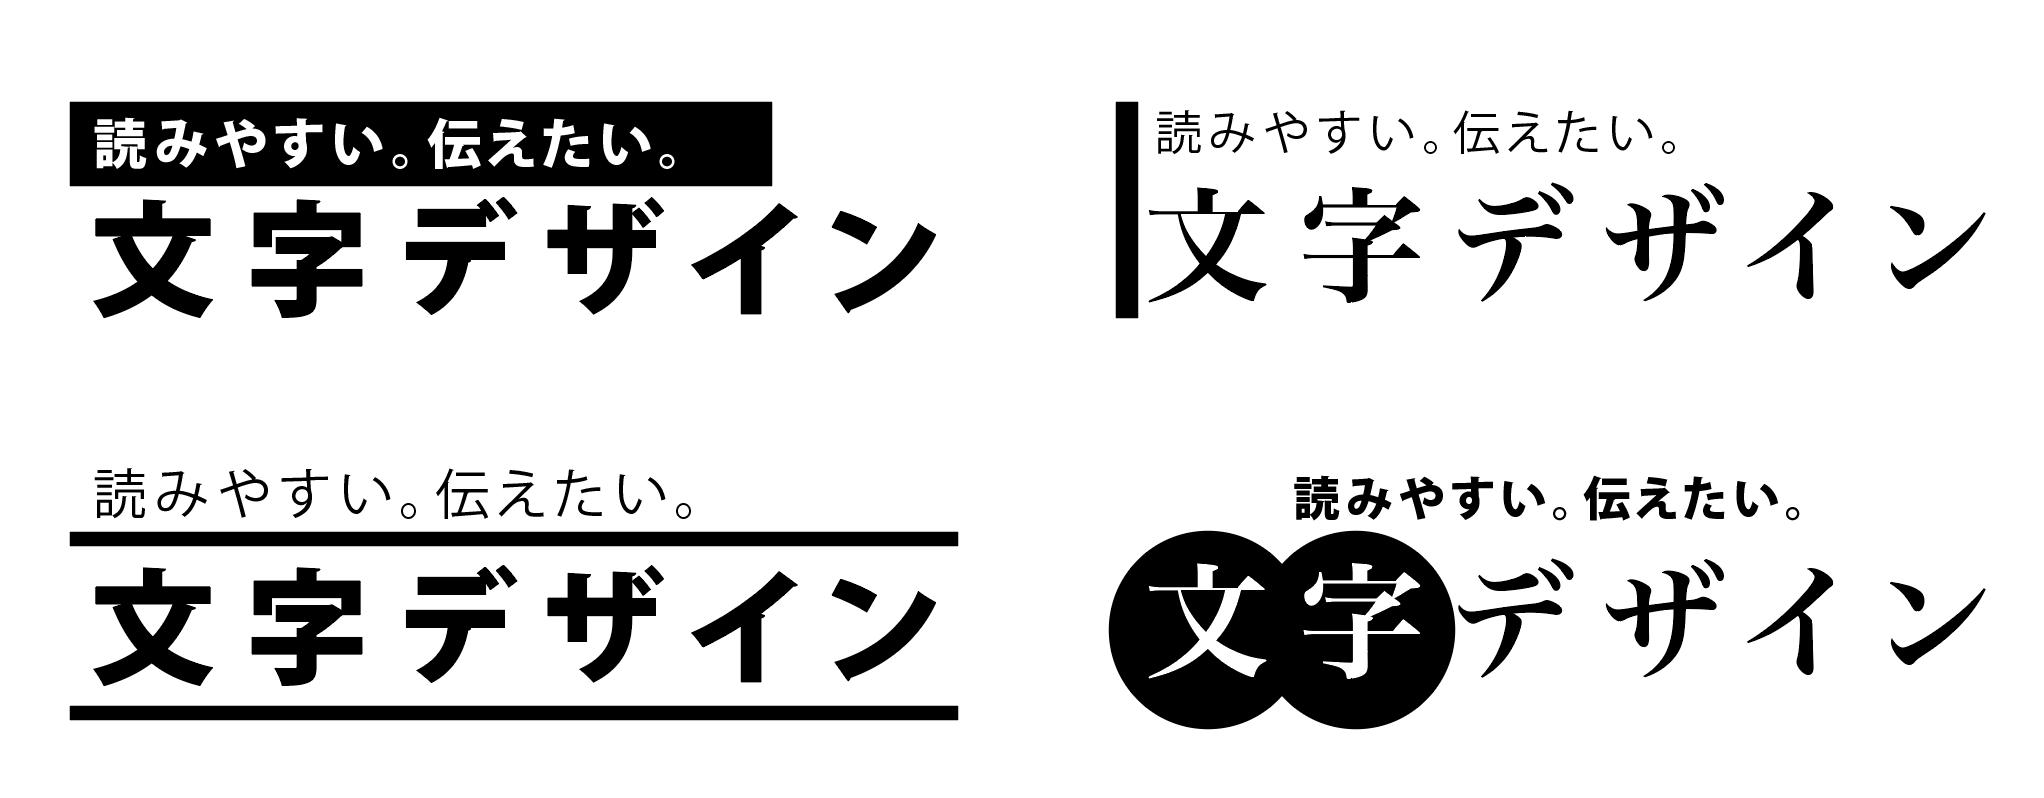 Illustrator_typesetting03